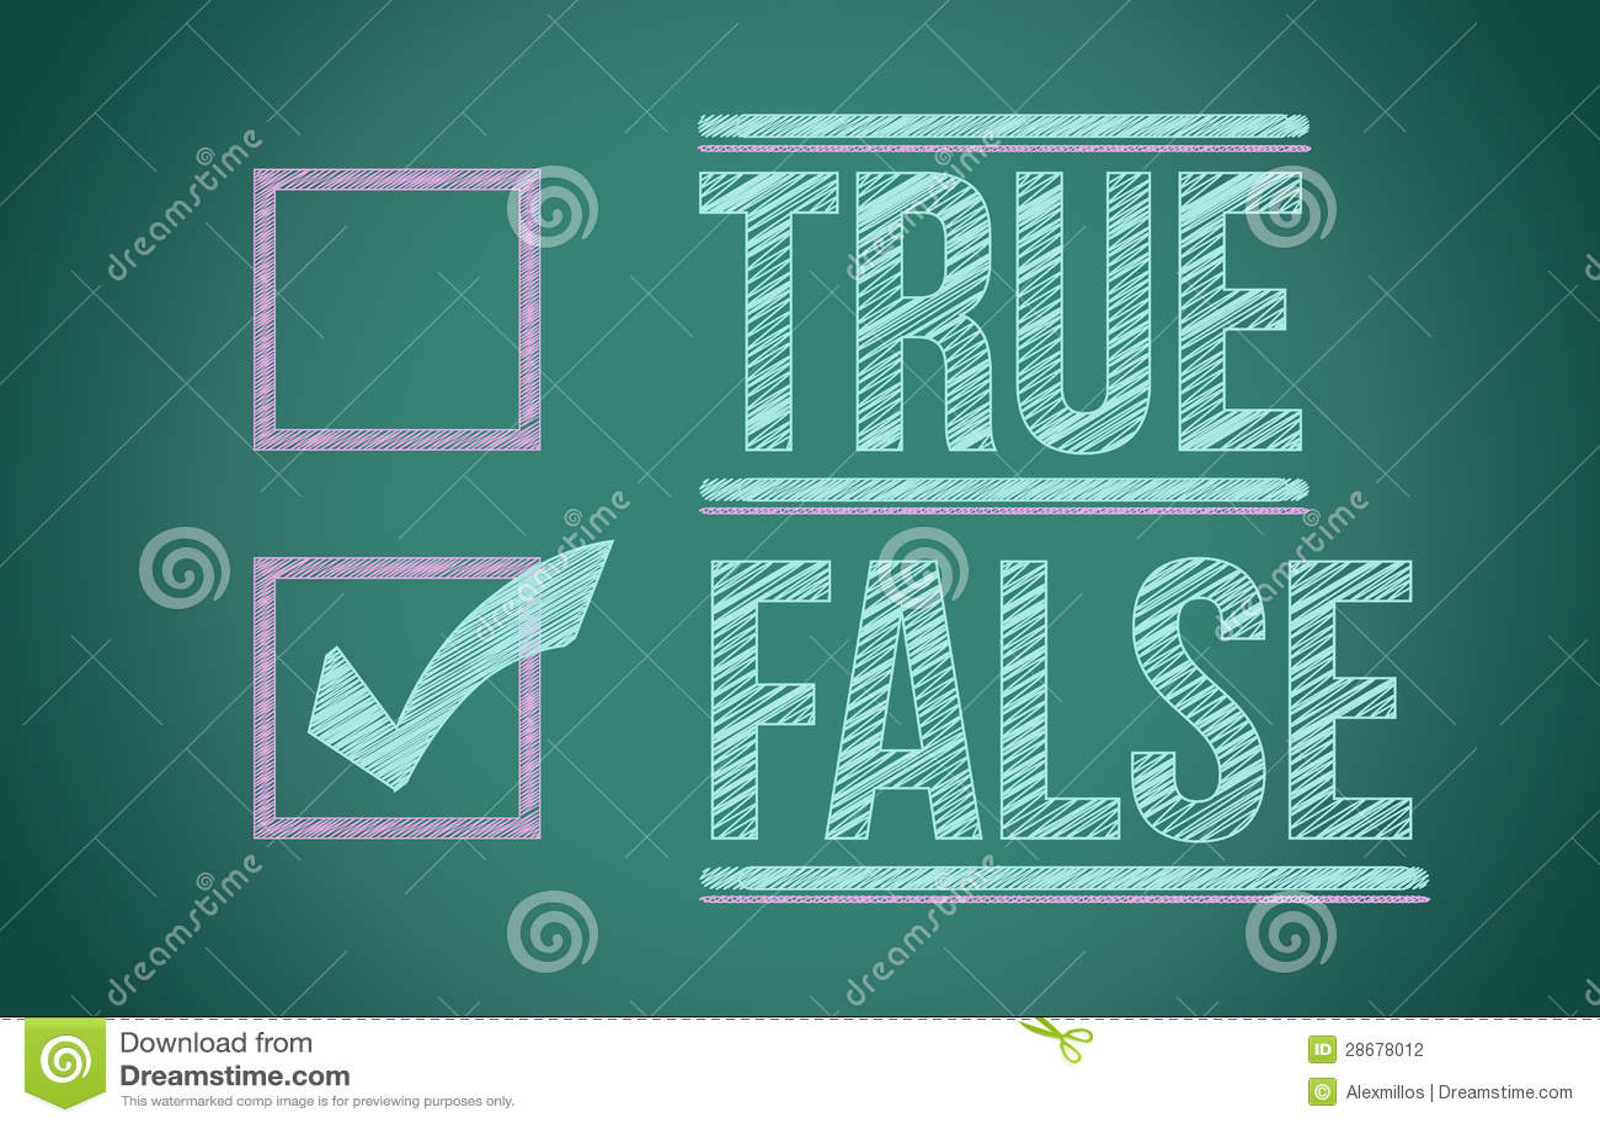 True And False Check Box Stock Photography Image 28678012